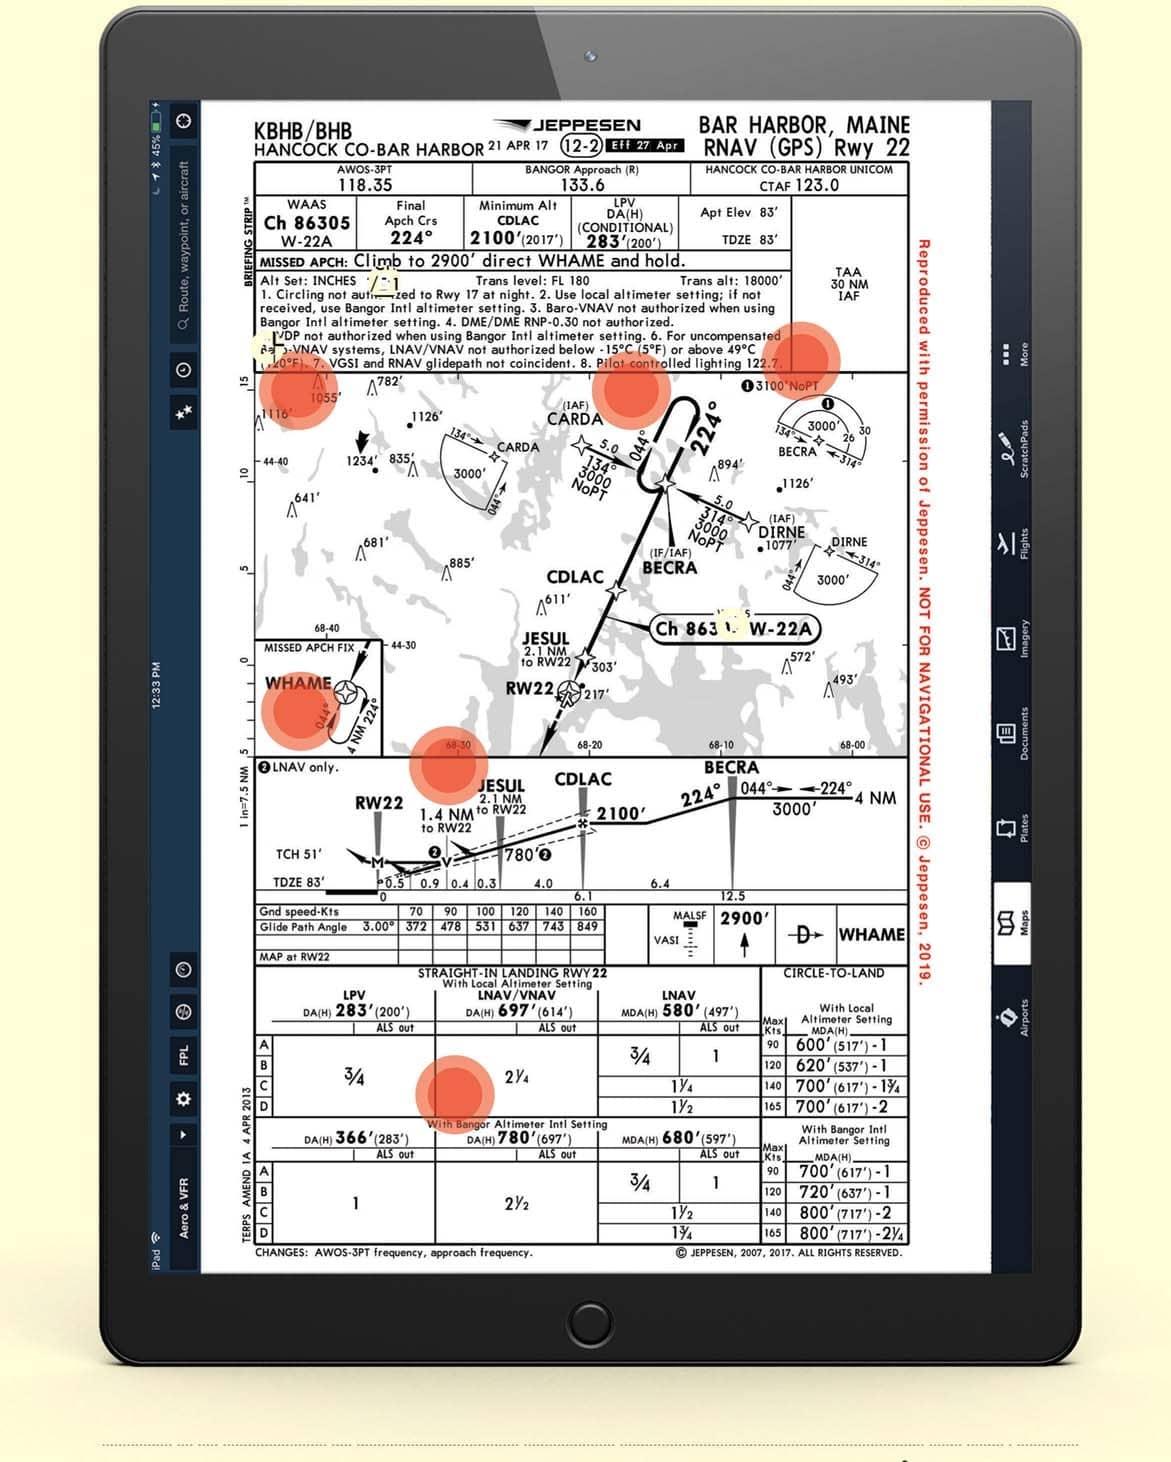 BAR HARBOR, MAINE, RNAV (GPS) RWY 22